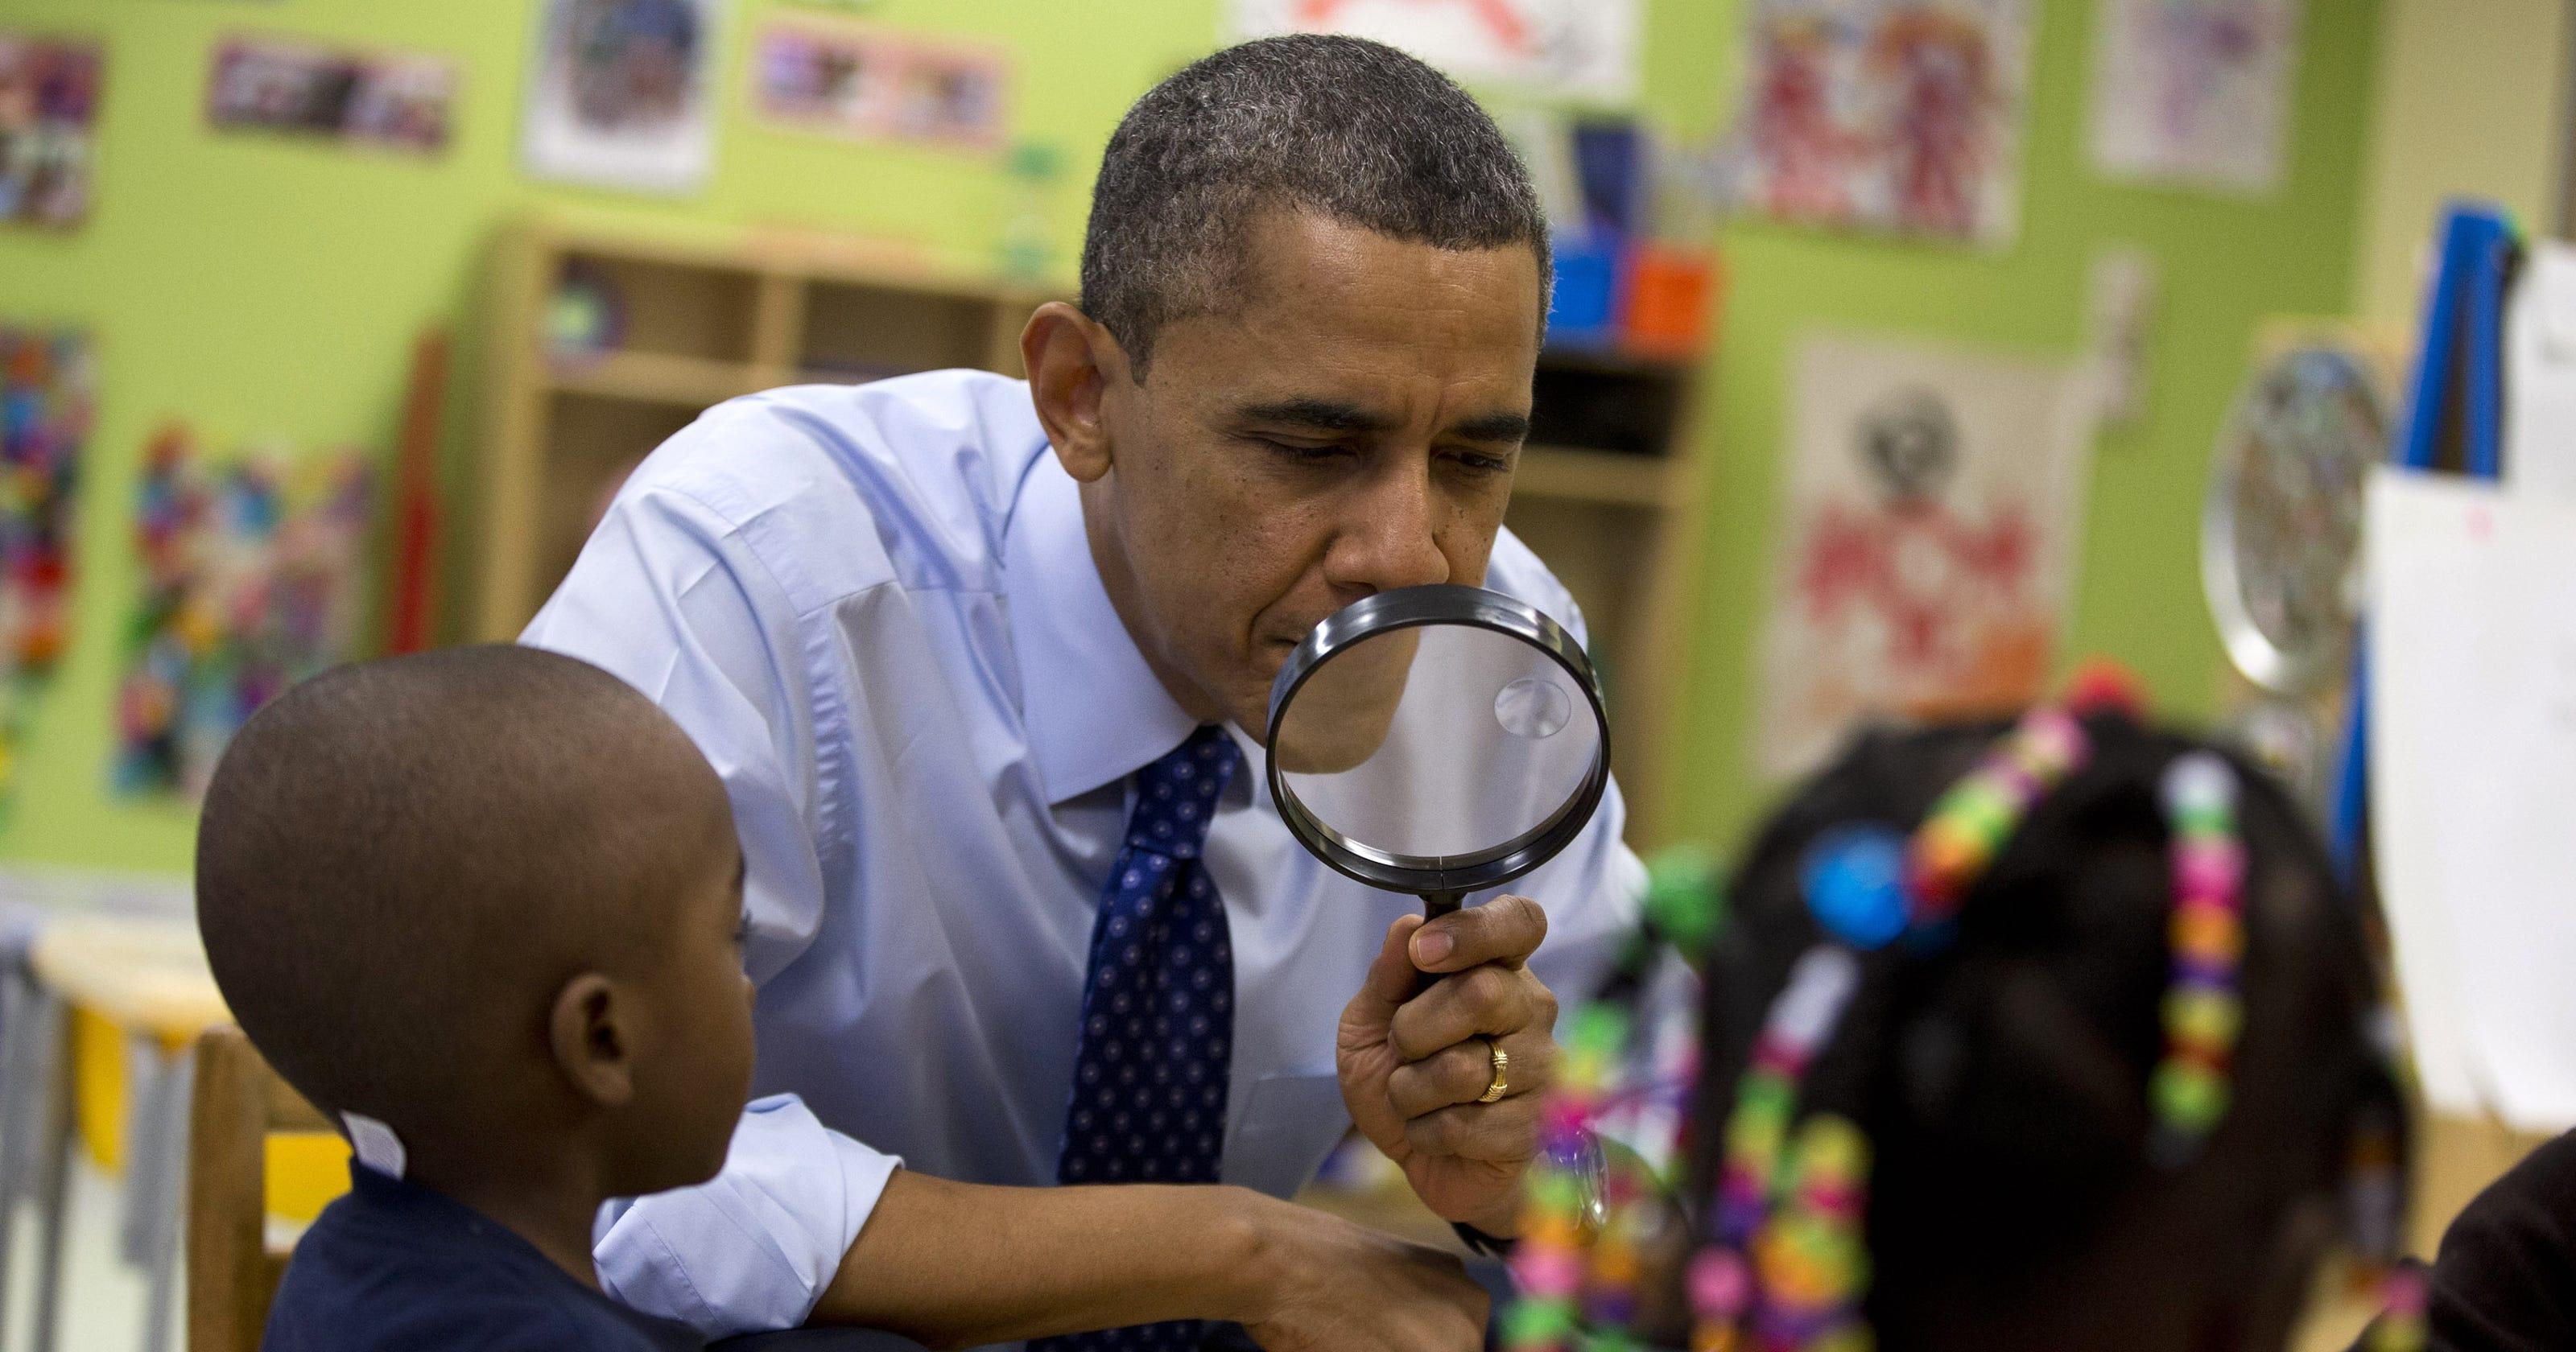 Kinder Garden: Obama Promotes Preschool Education In Georgia Visit